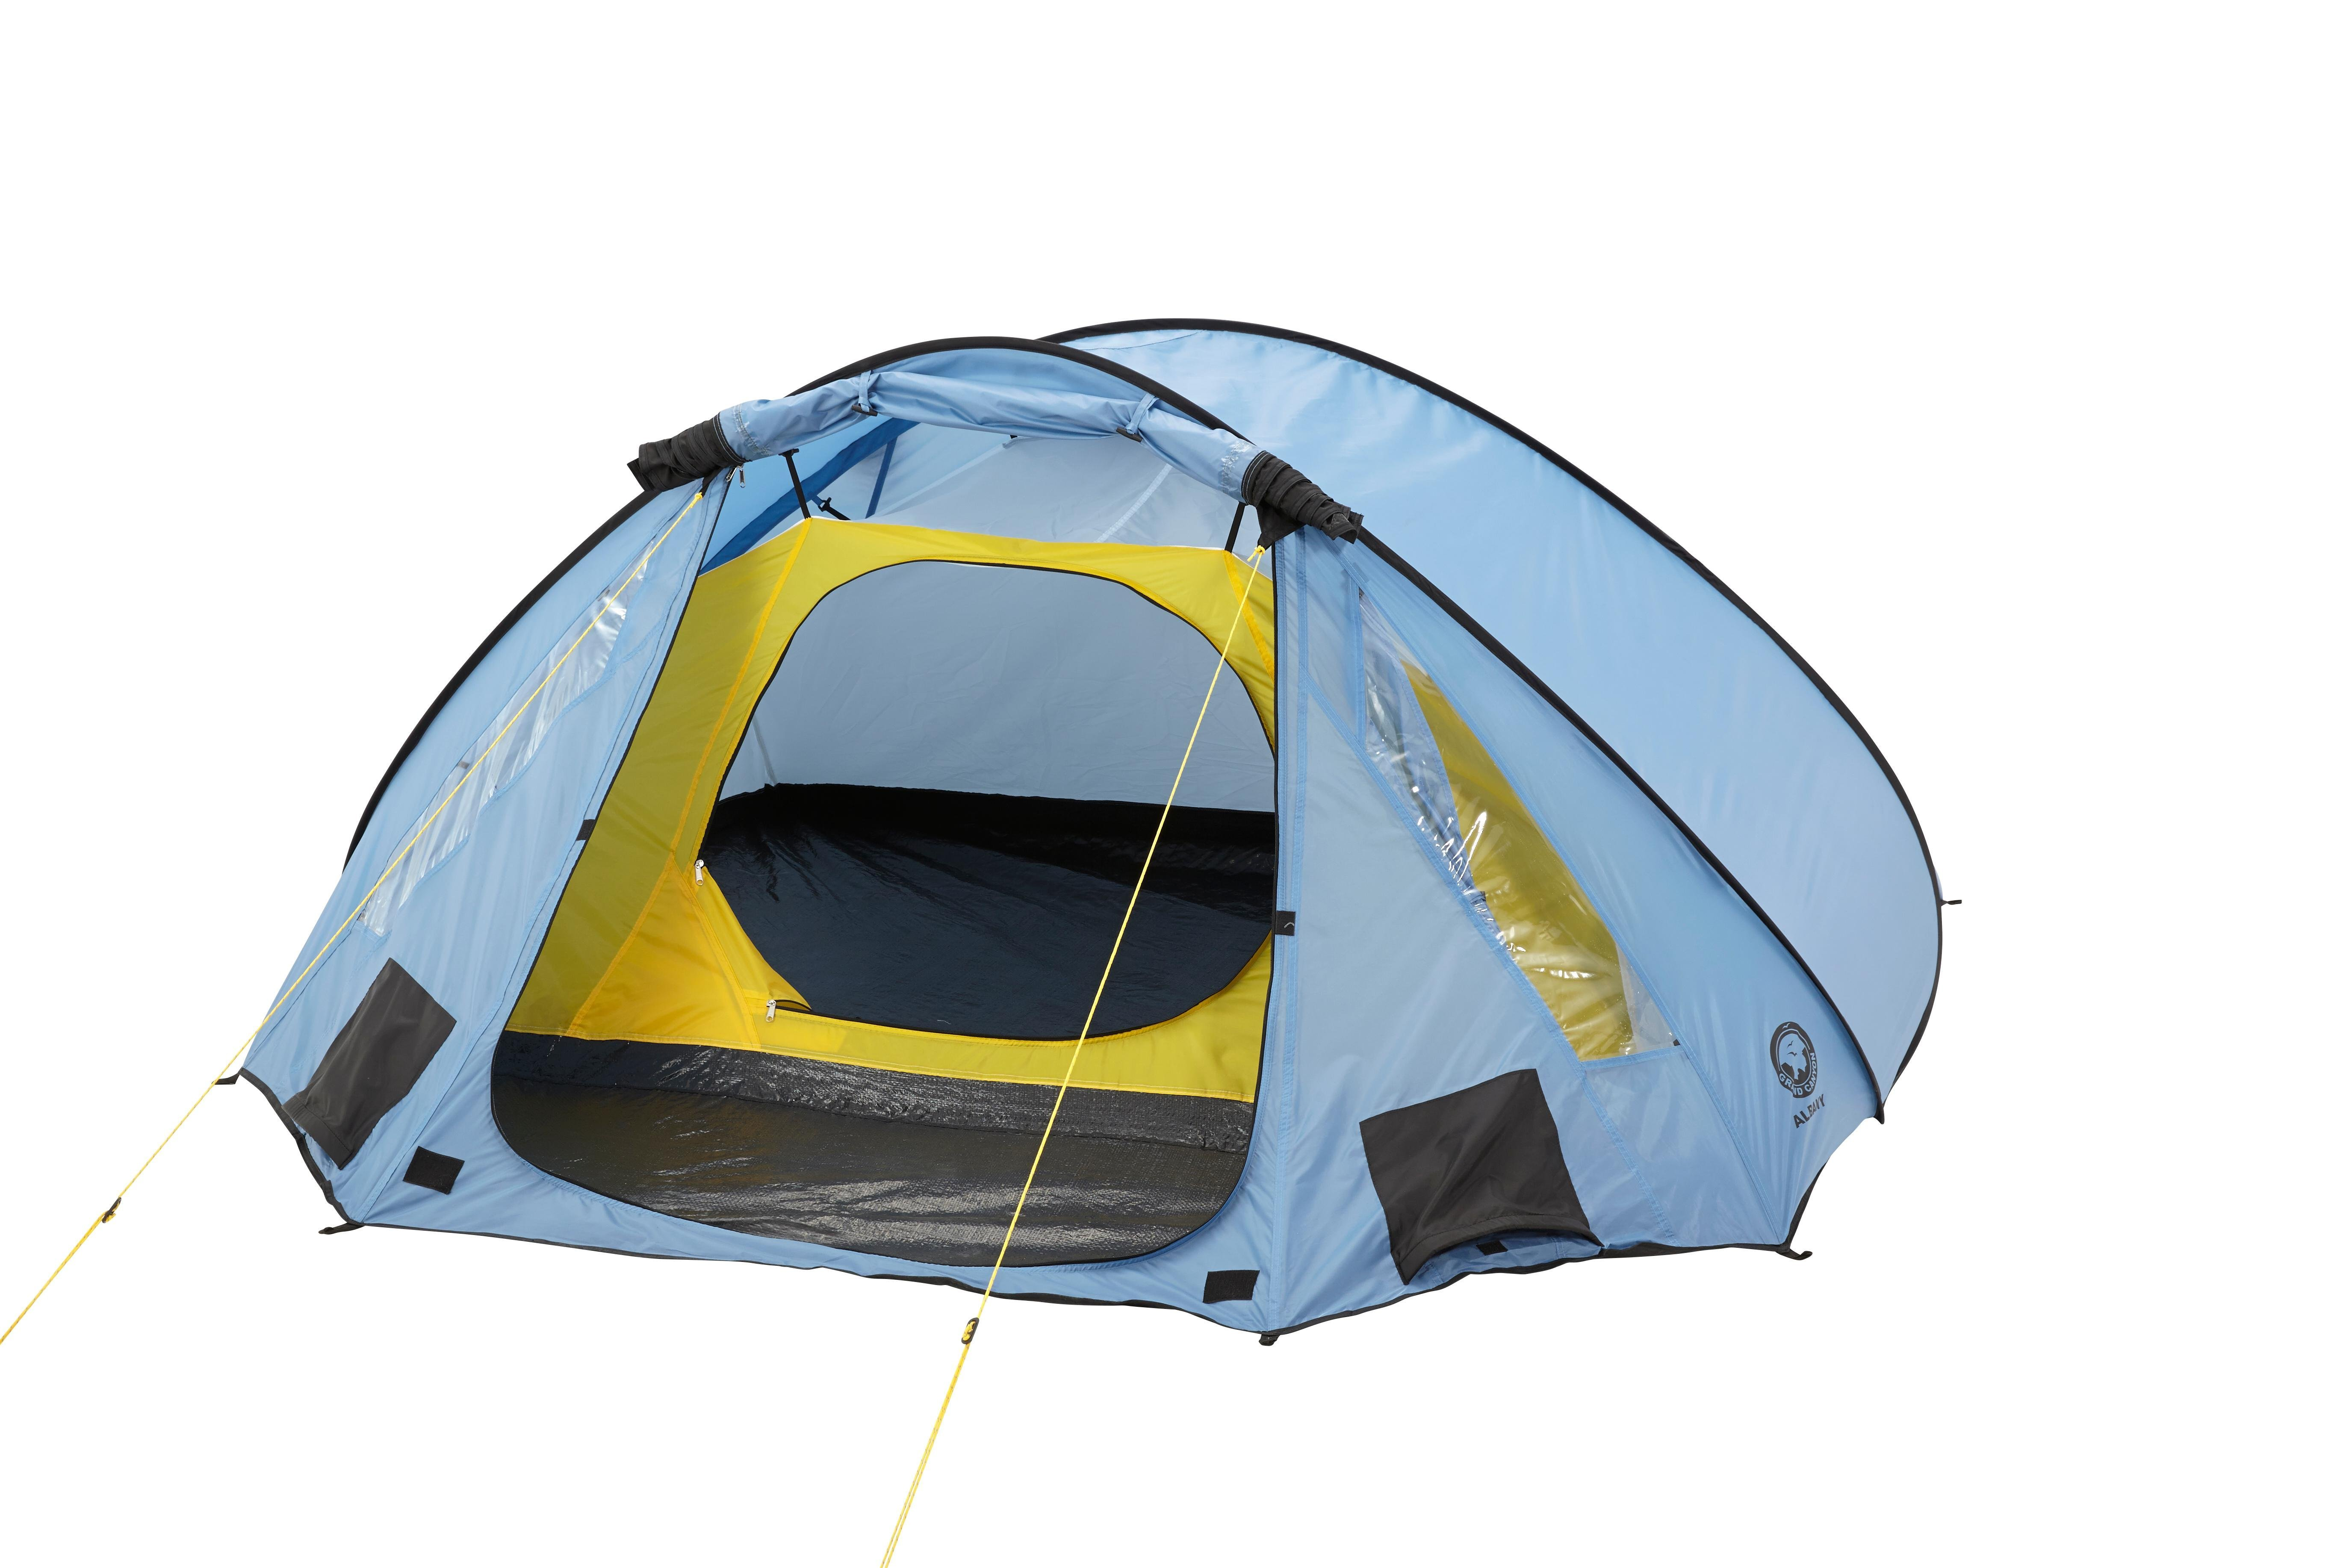 grand canyon albany 2 wurfzelt 2 3 personen zelt blau schwarz 302200 sport. Black Bedroom Furniture Sets. Home Design Ideas